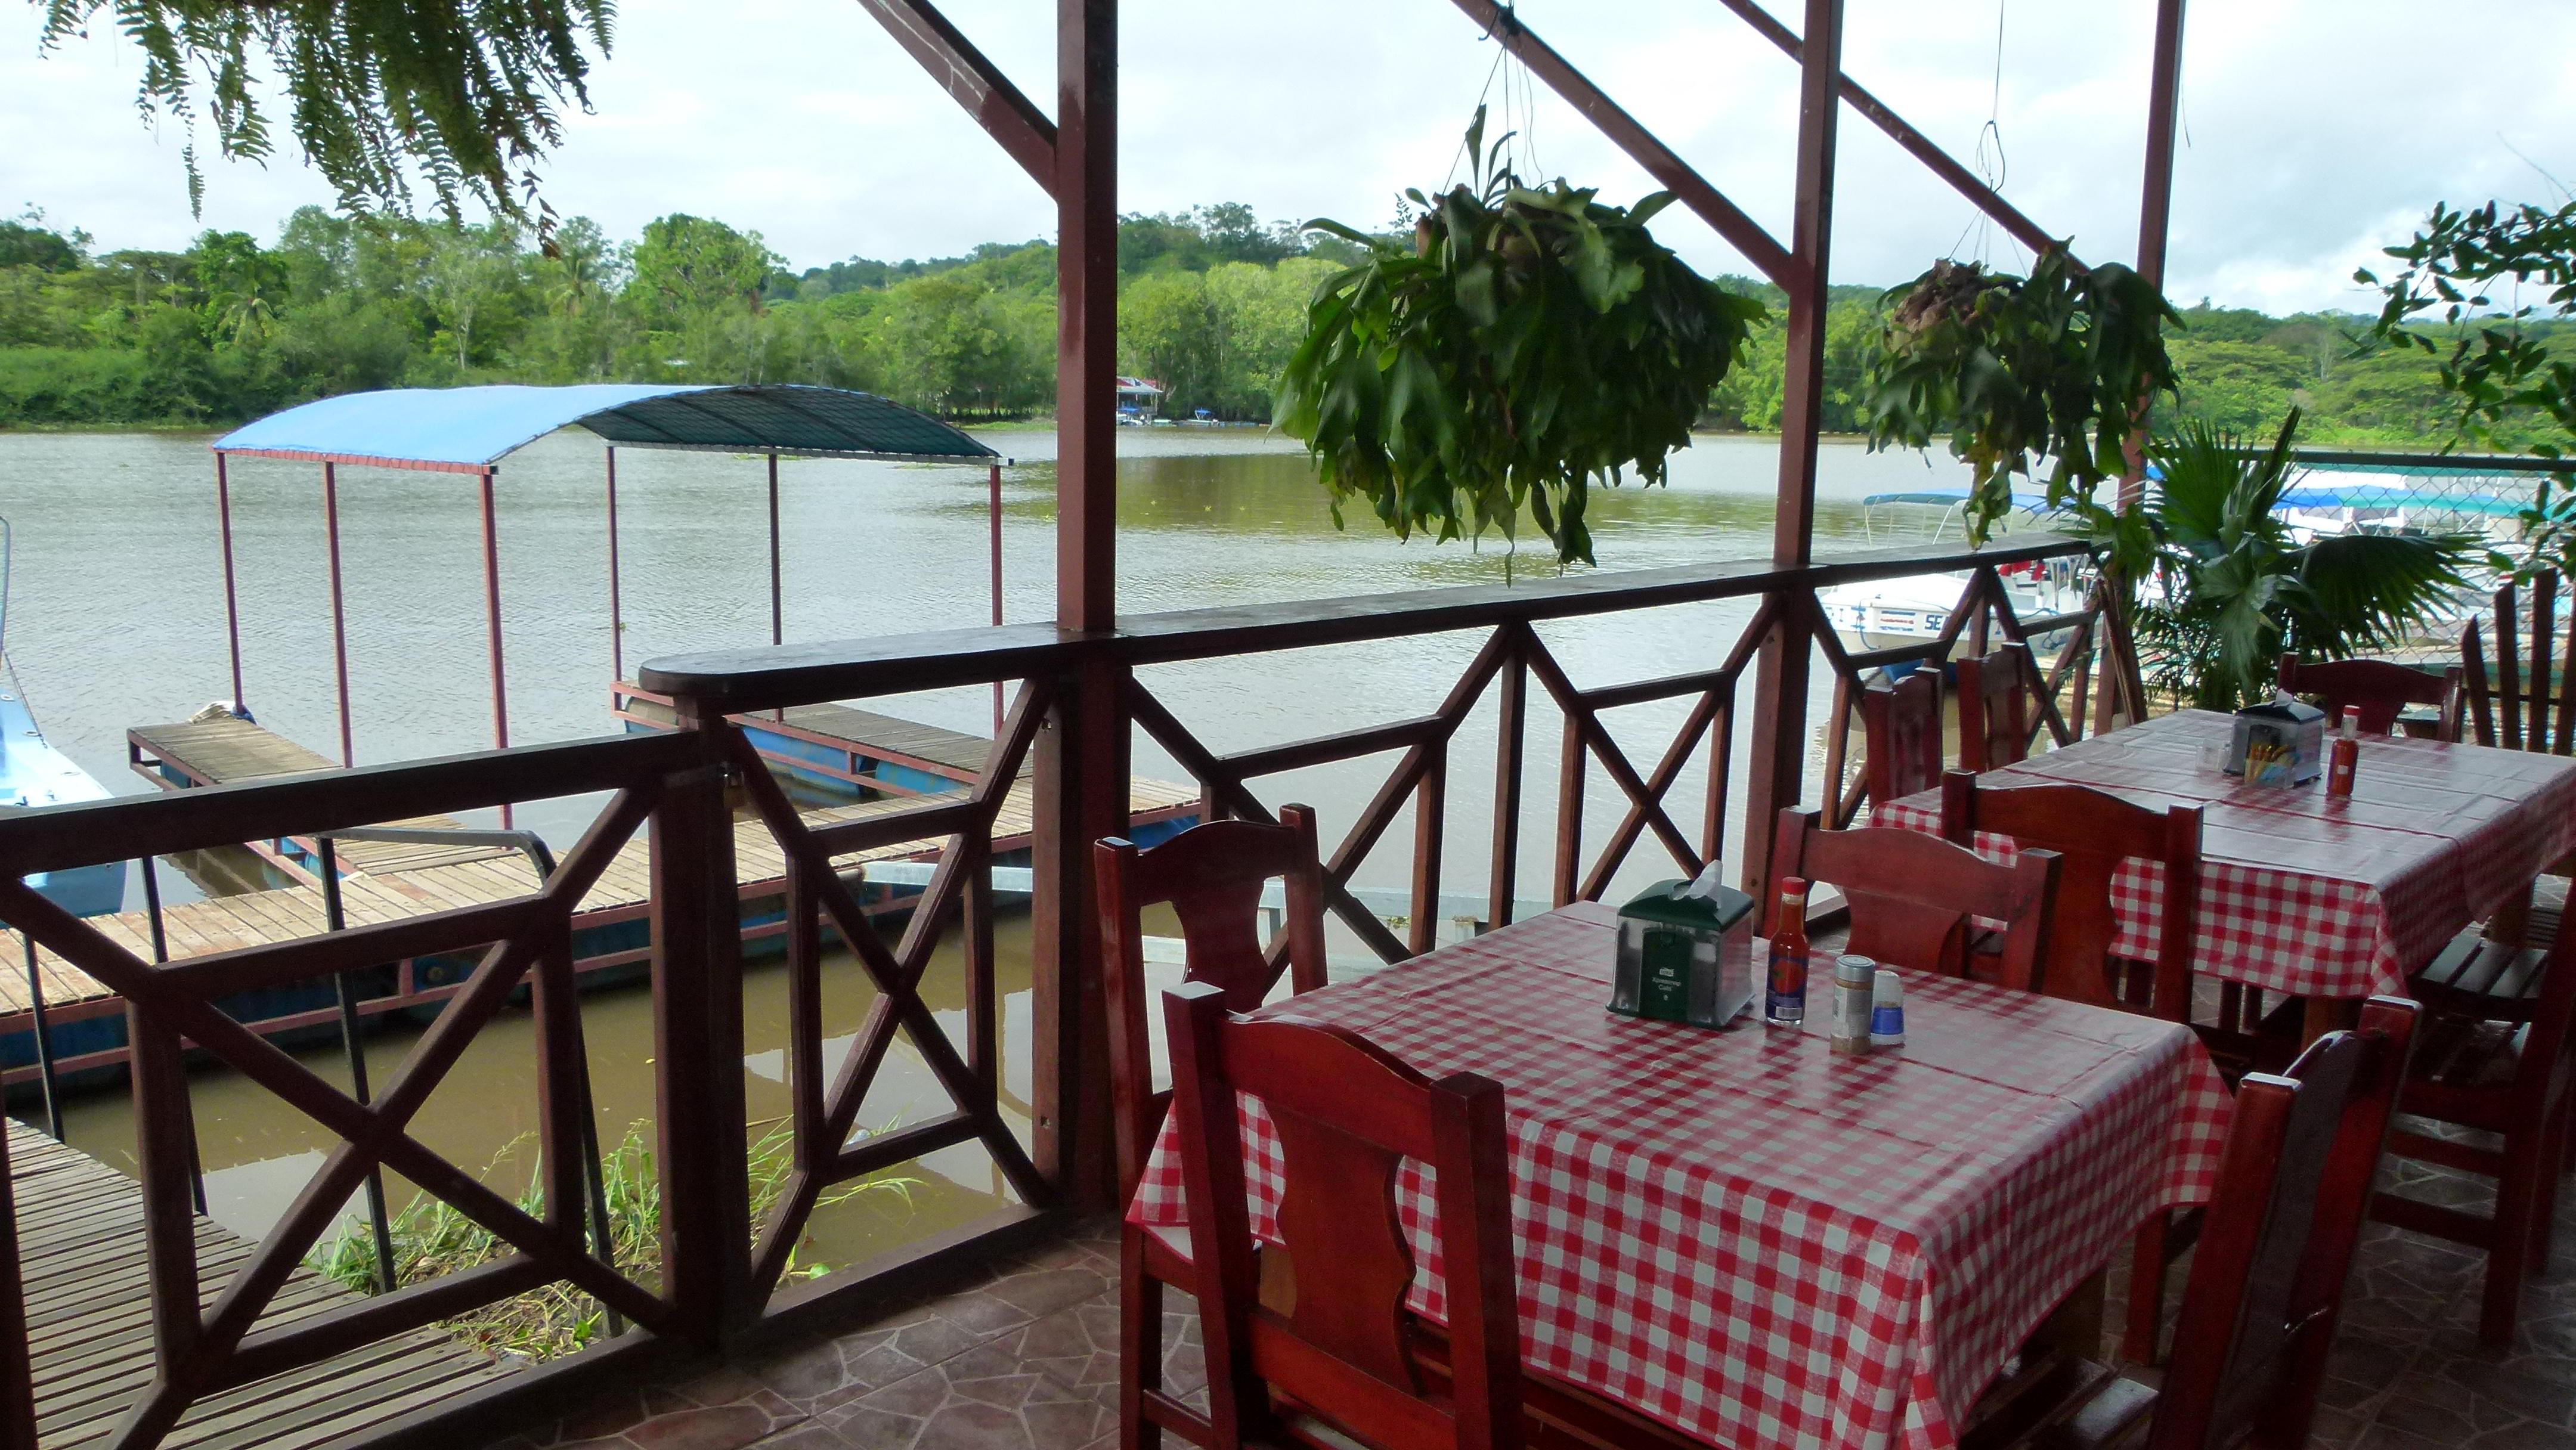 kokomana-restaurant-sierpe-kokopelli-bar-tour-mangrove-osa-enjoy-puravida